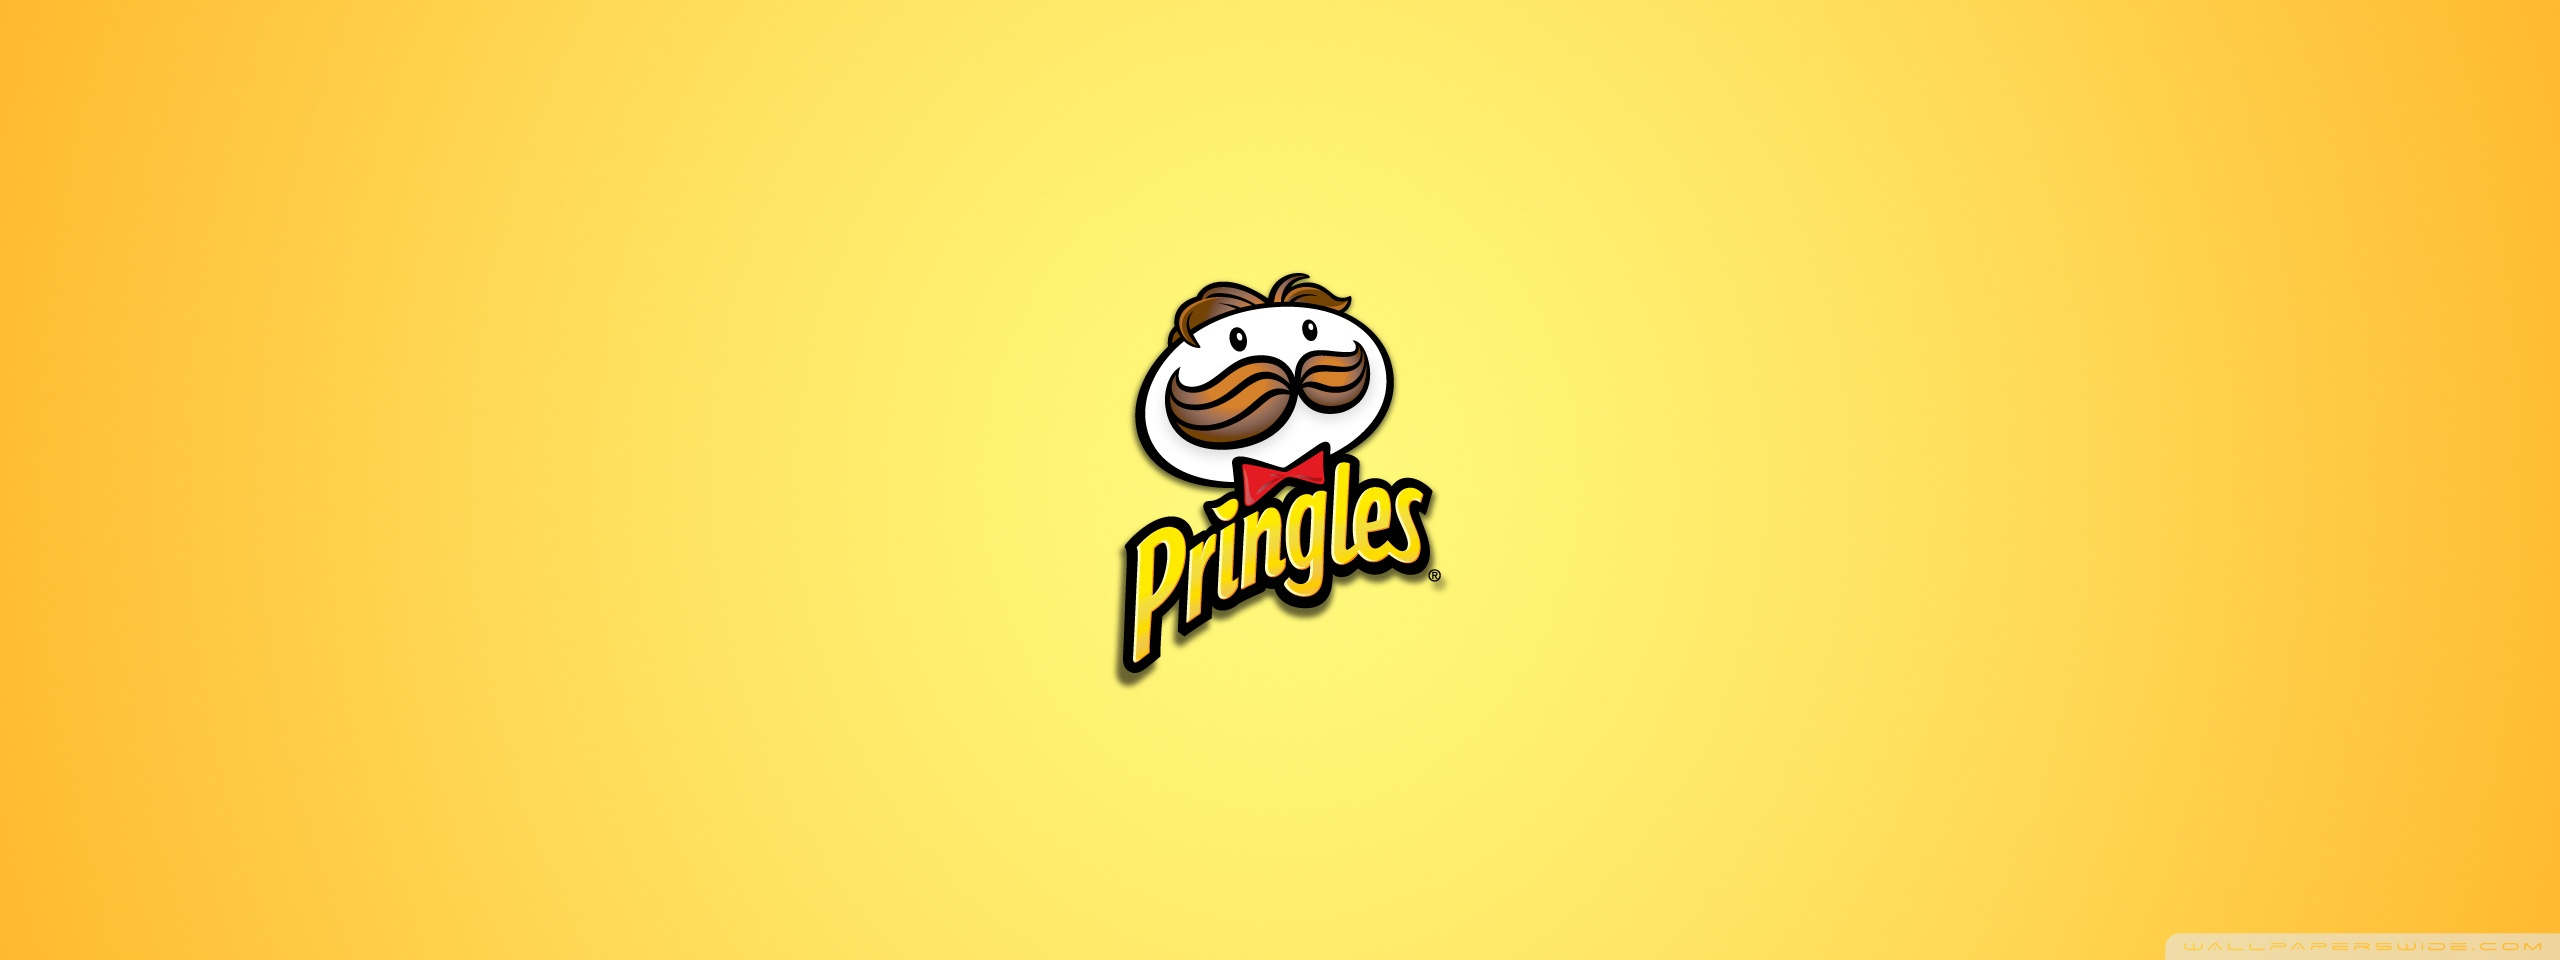 Pringles Guy 4K HD Desktop Wallpaper for 4K Ultra HD TV Dual 2560x960